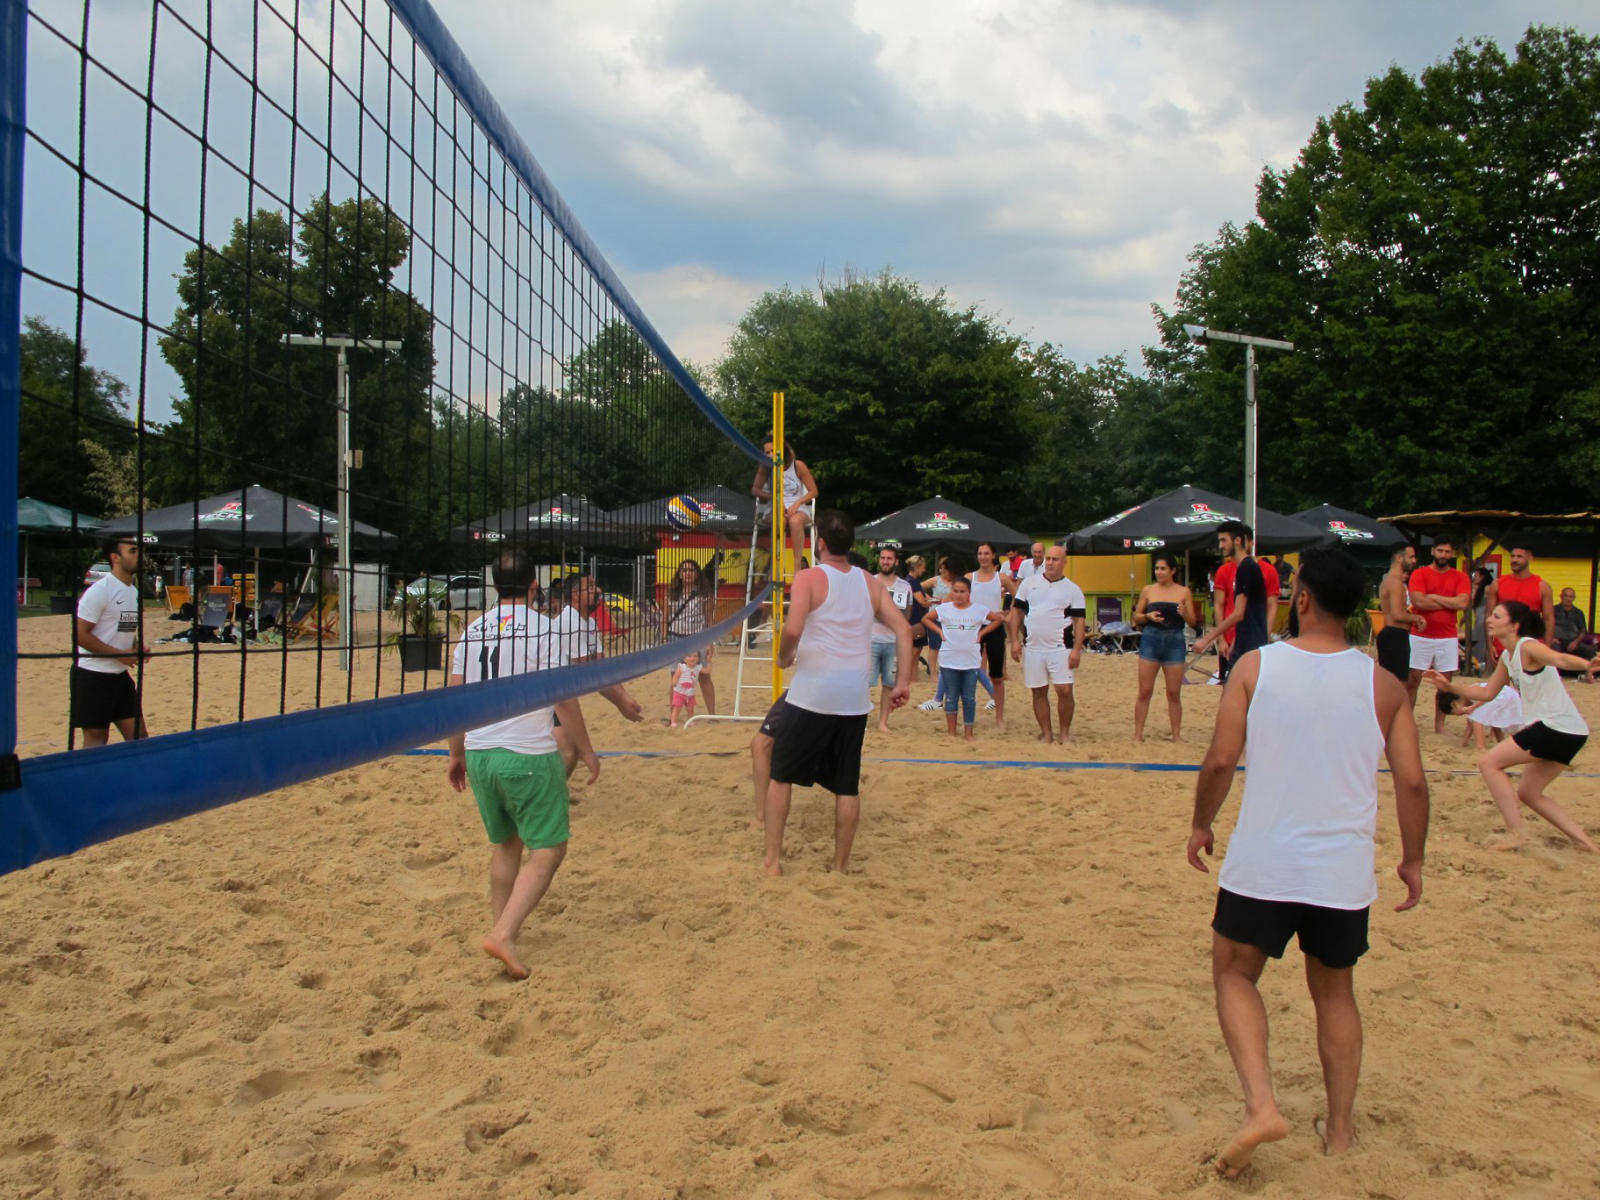 Beachvolleyball-Turnier 2018 - FV Altheim e.V.